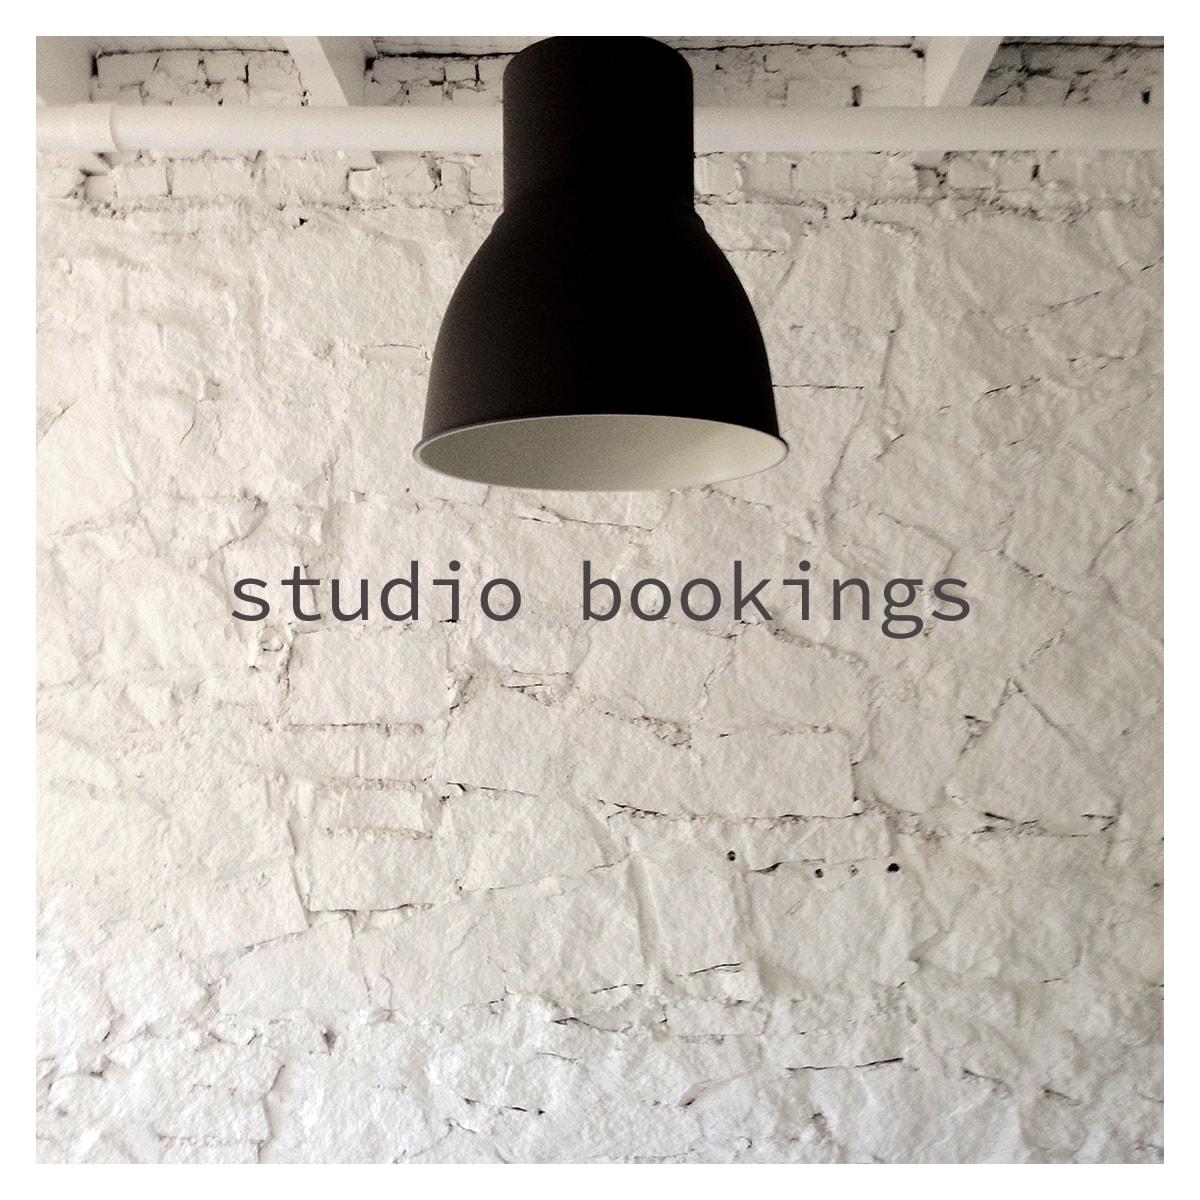 foster studio booking